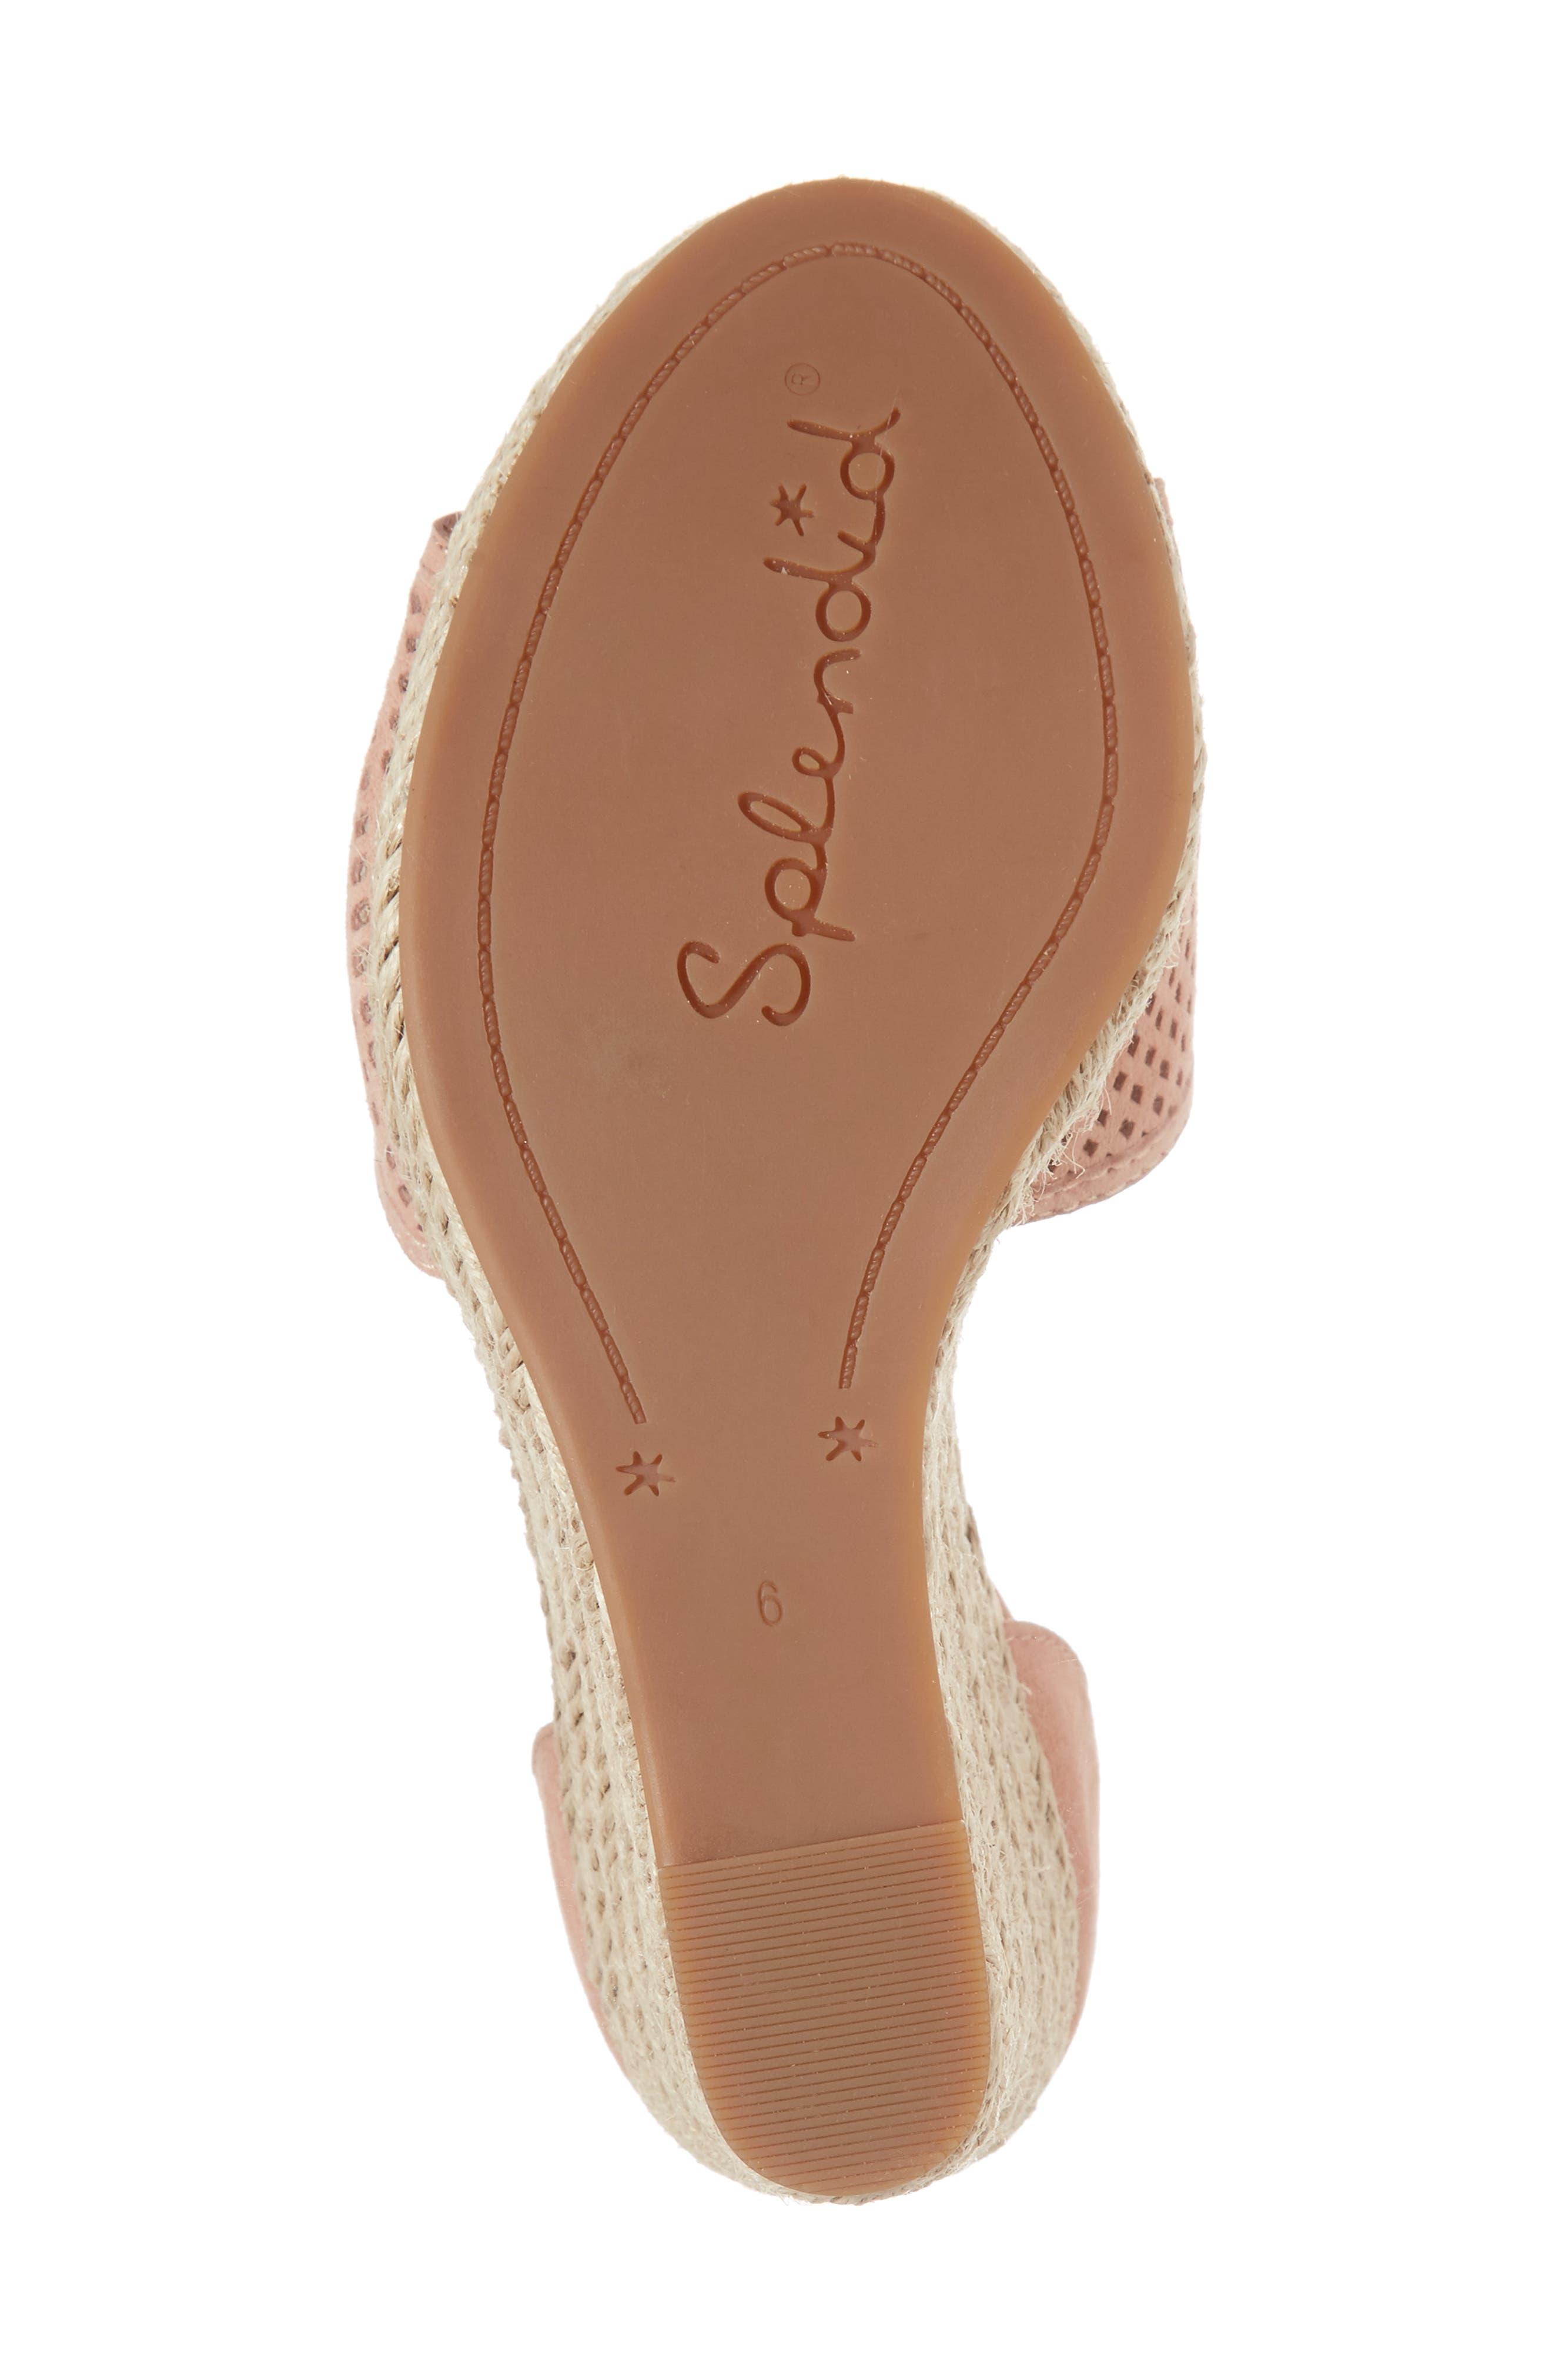 Bentley Espadrille Wedge Sandal,                             Alternate thumbnail 18, color,